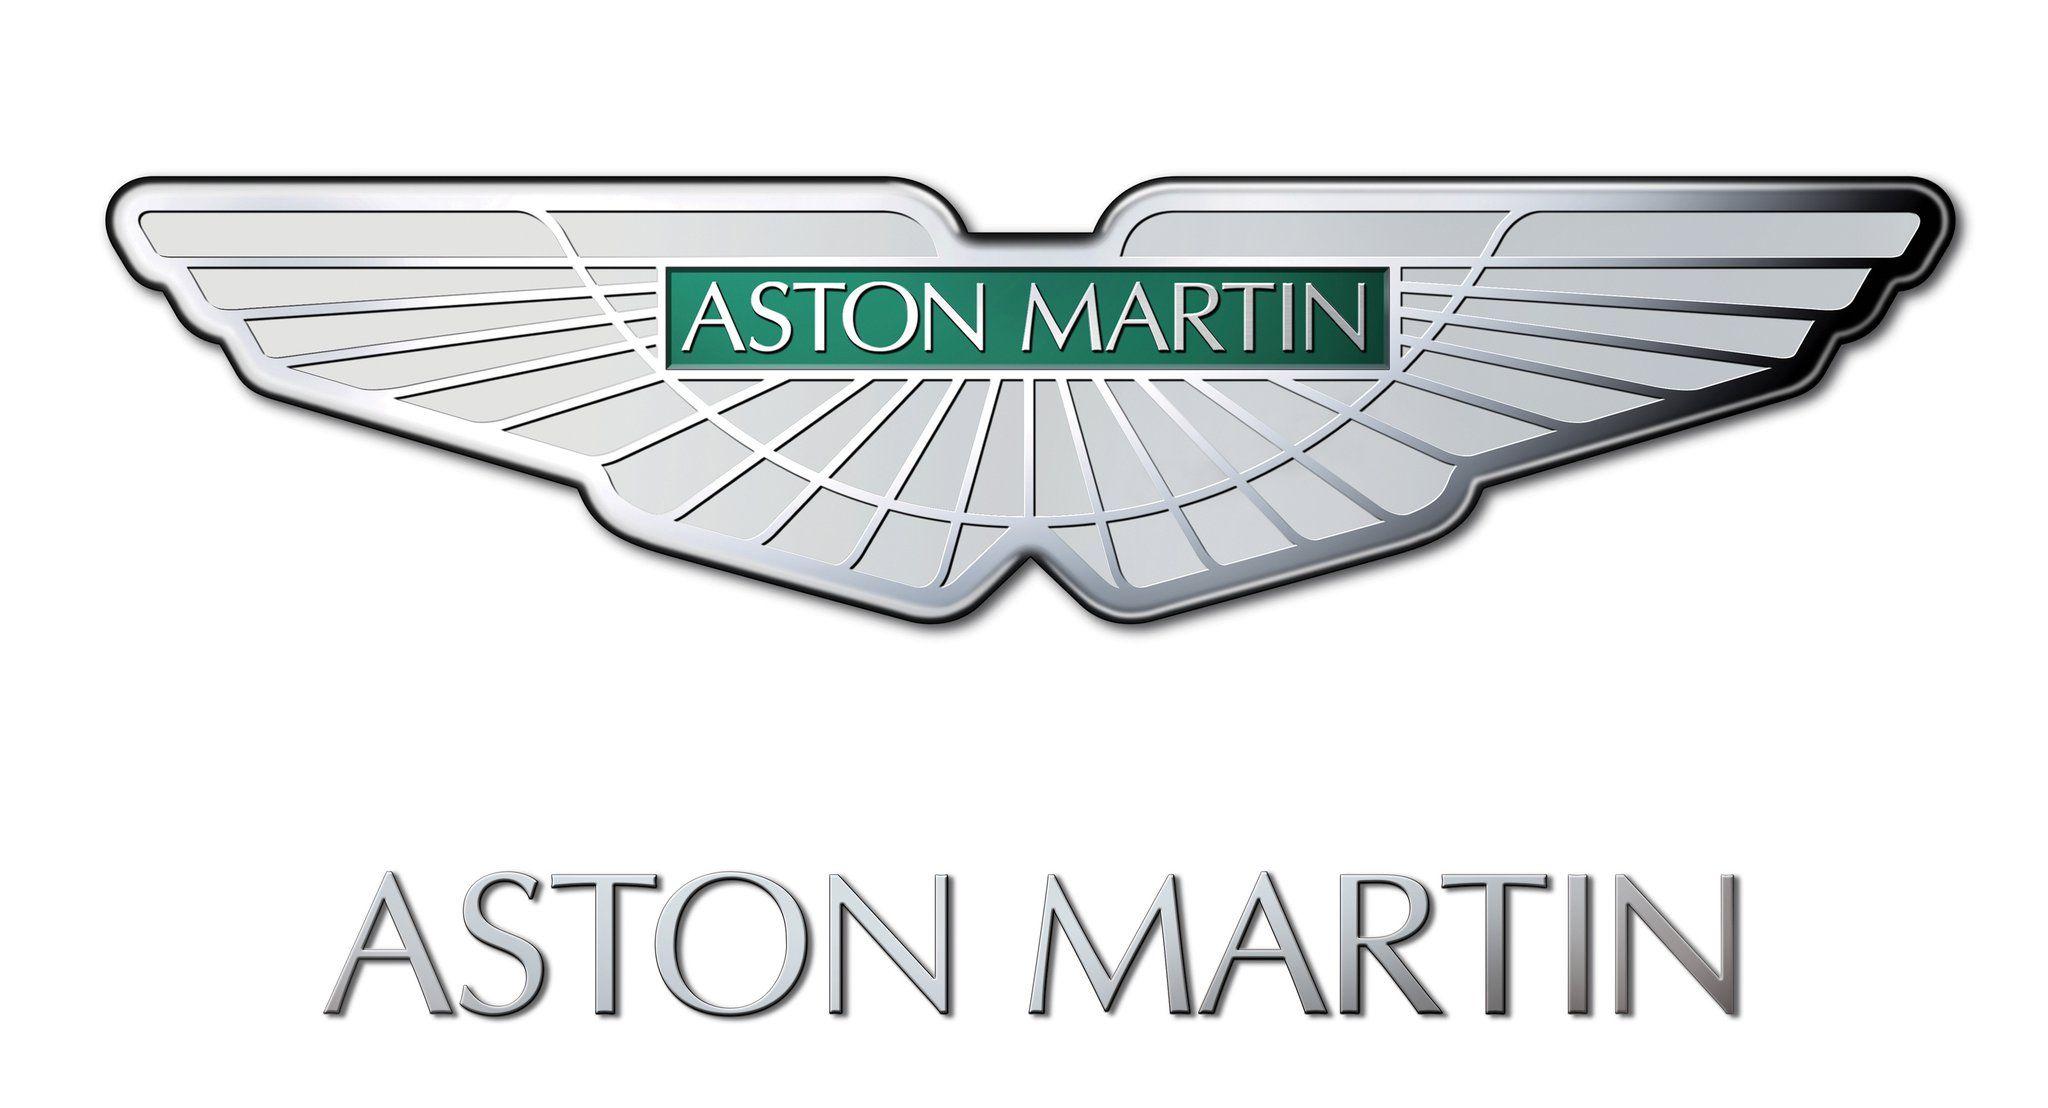 Aston Martin Auto Marca